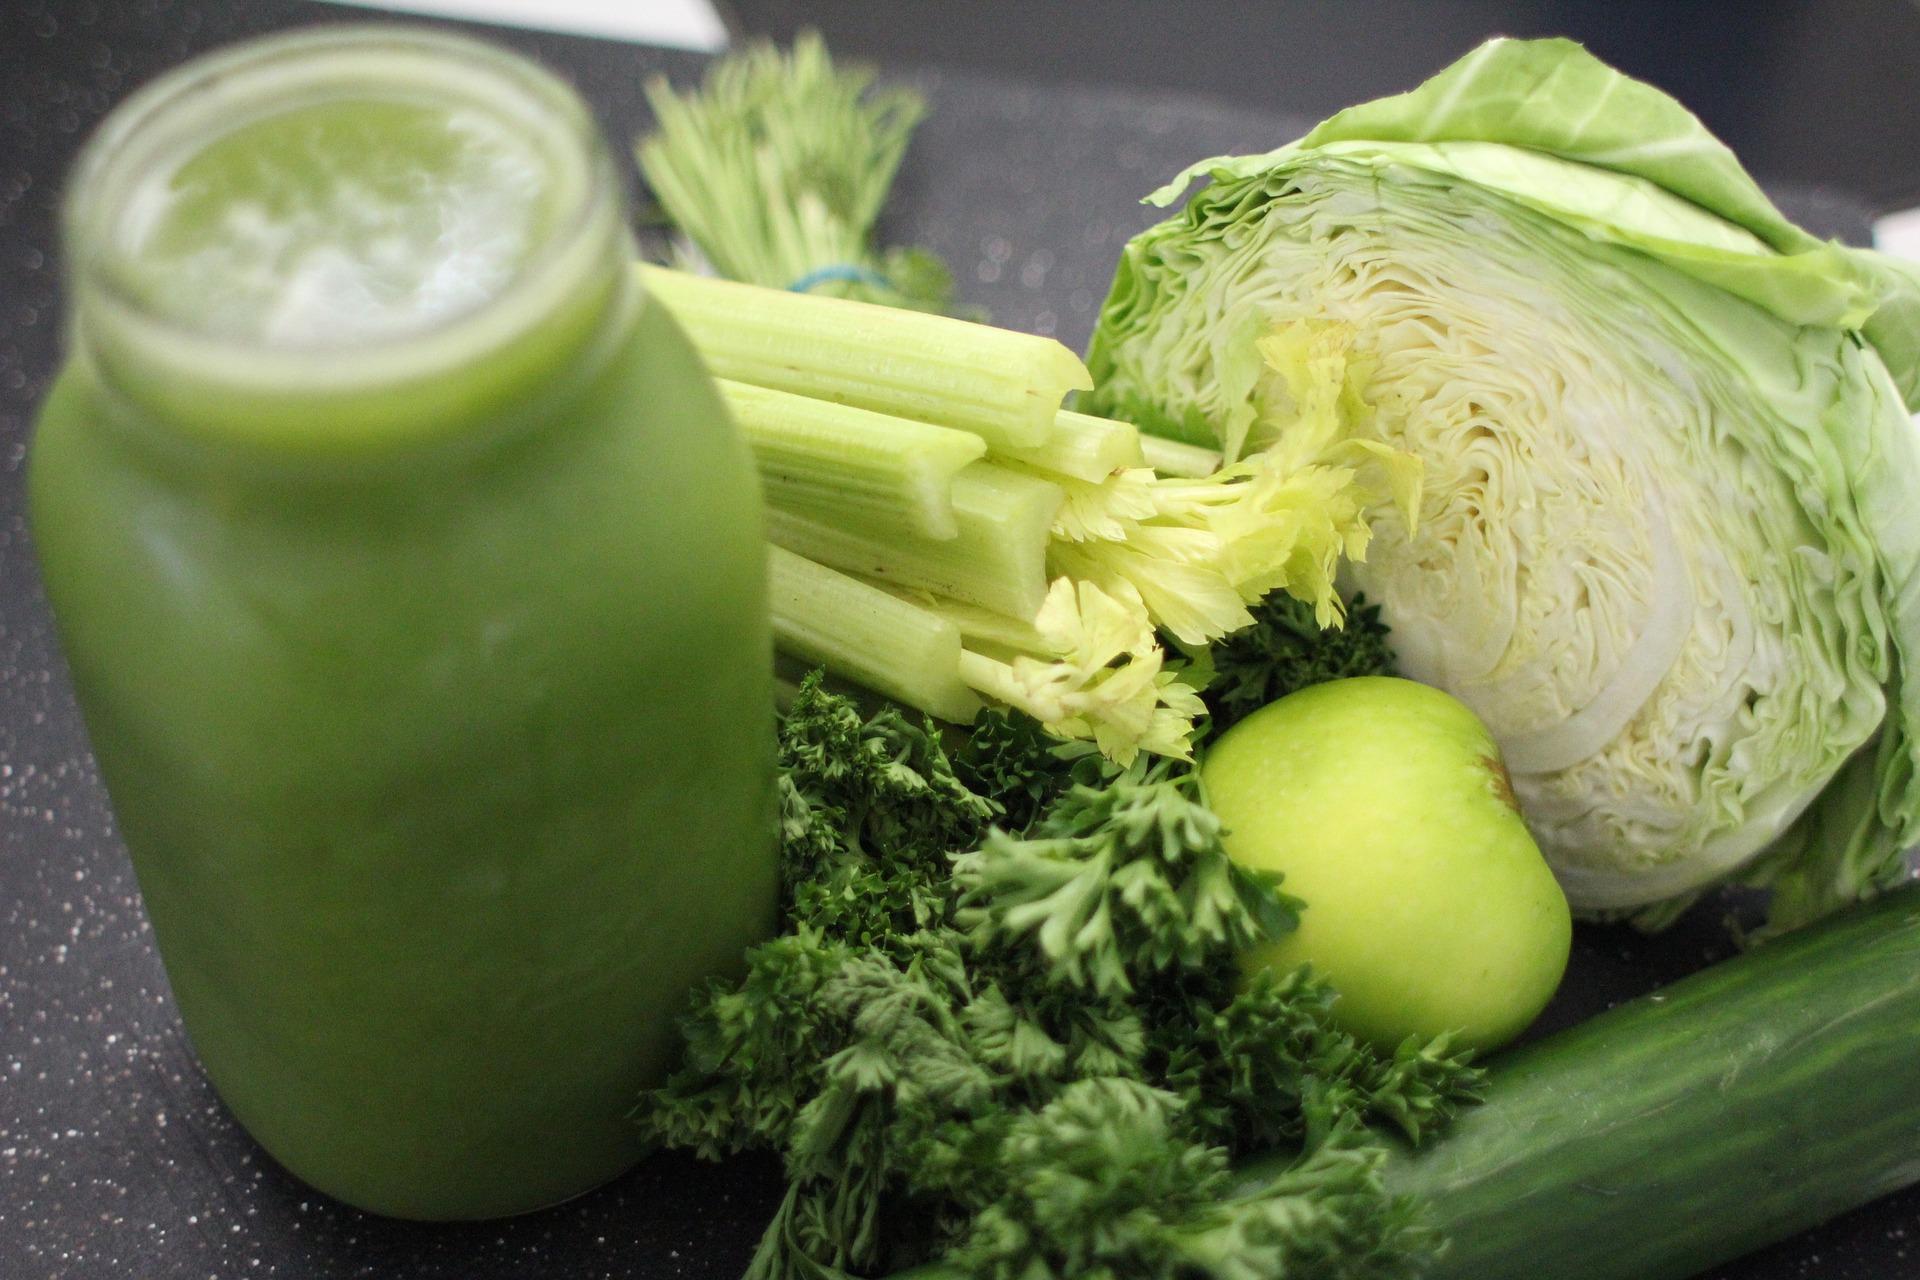 green-juice-769129 1920